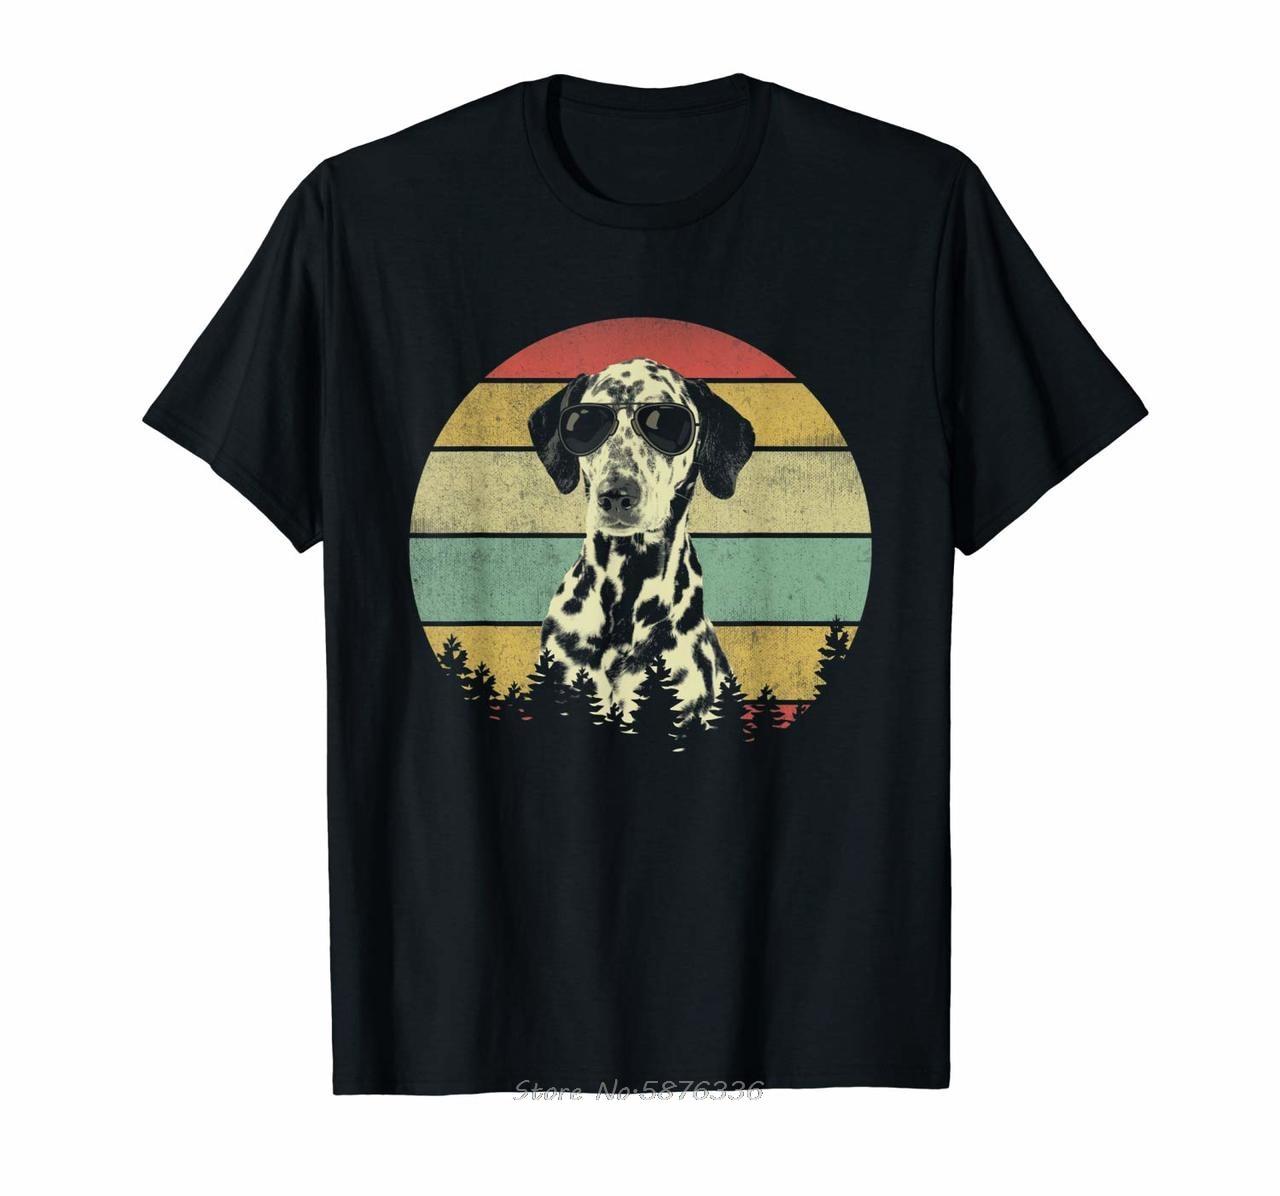 Vintage Dalmatian T-shirt Dalmatian Lover Gift Dog Dad Mom T Shirt For Men Women Male Female Girl Tshirts Funny Summer Tees